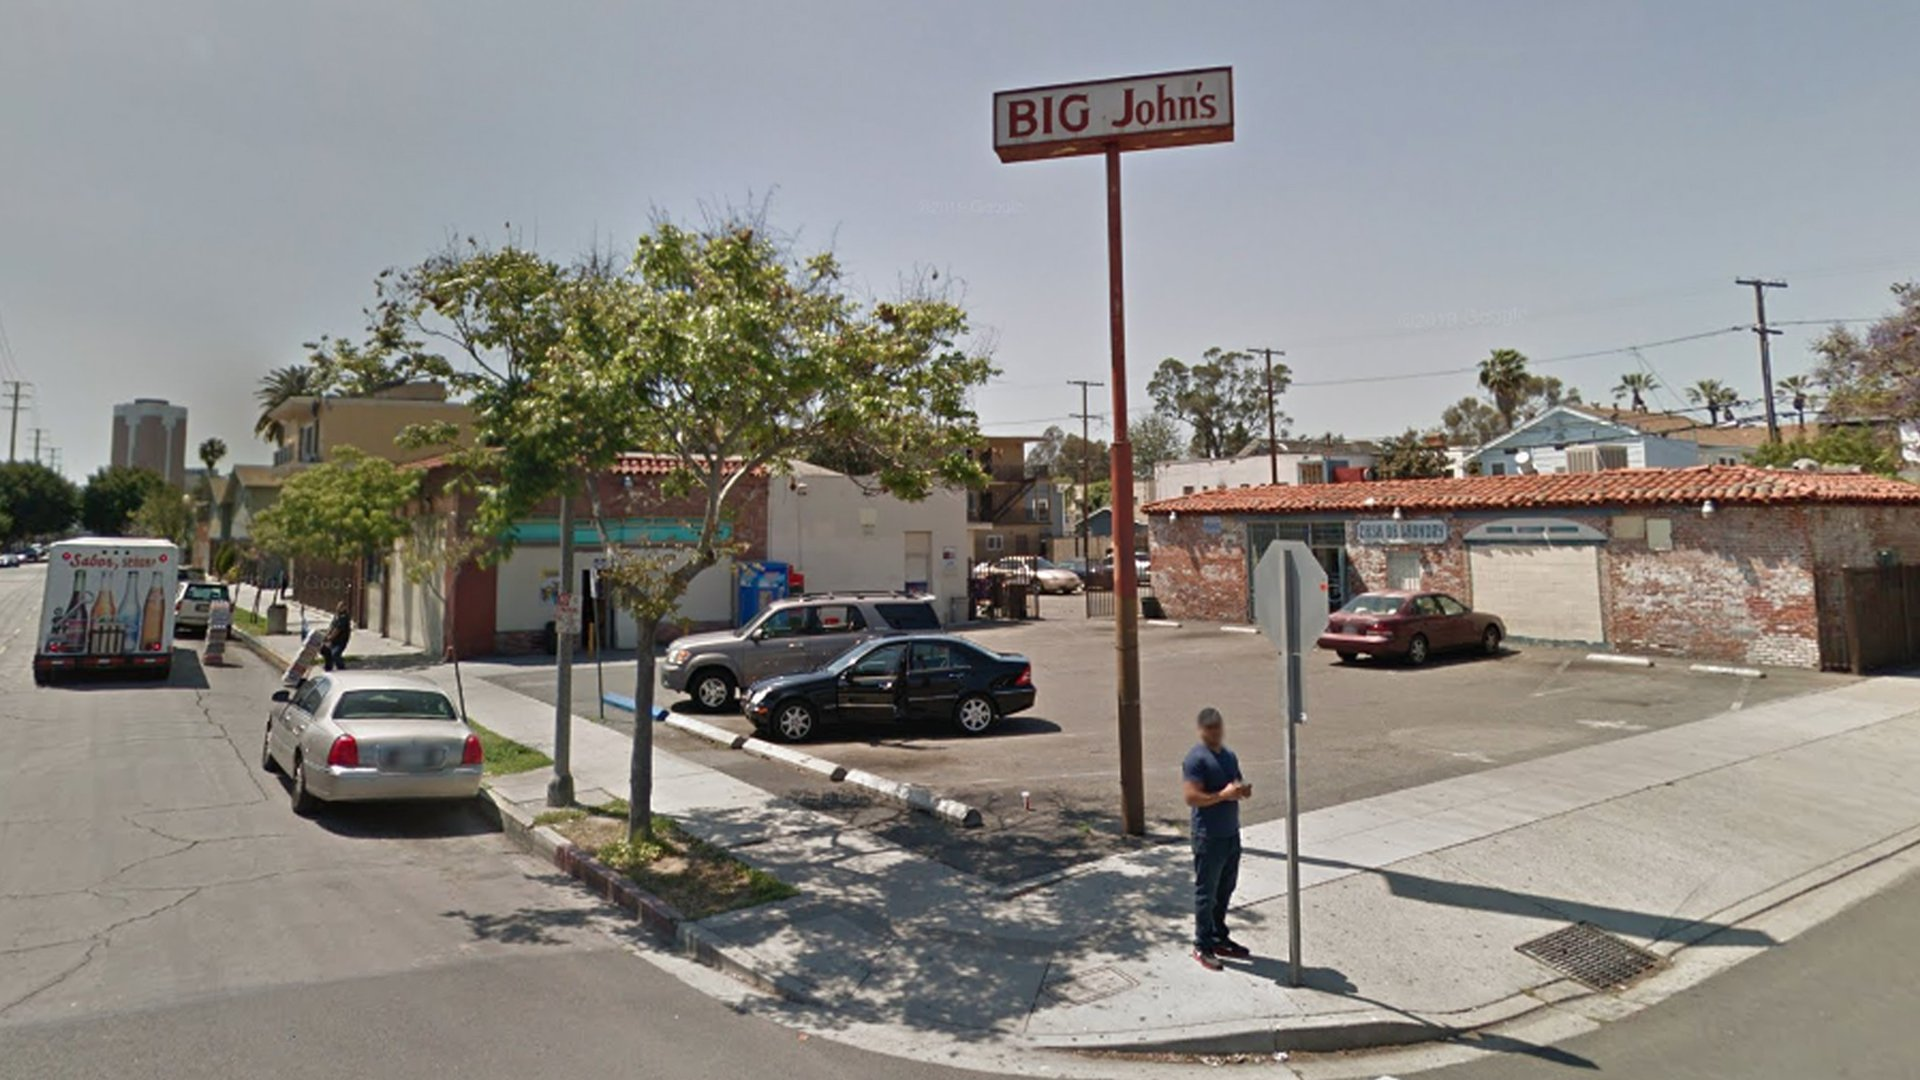 Big John's Liquor in Long Beach is seen in a Google Maps Street View image.